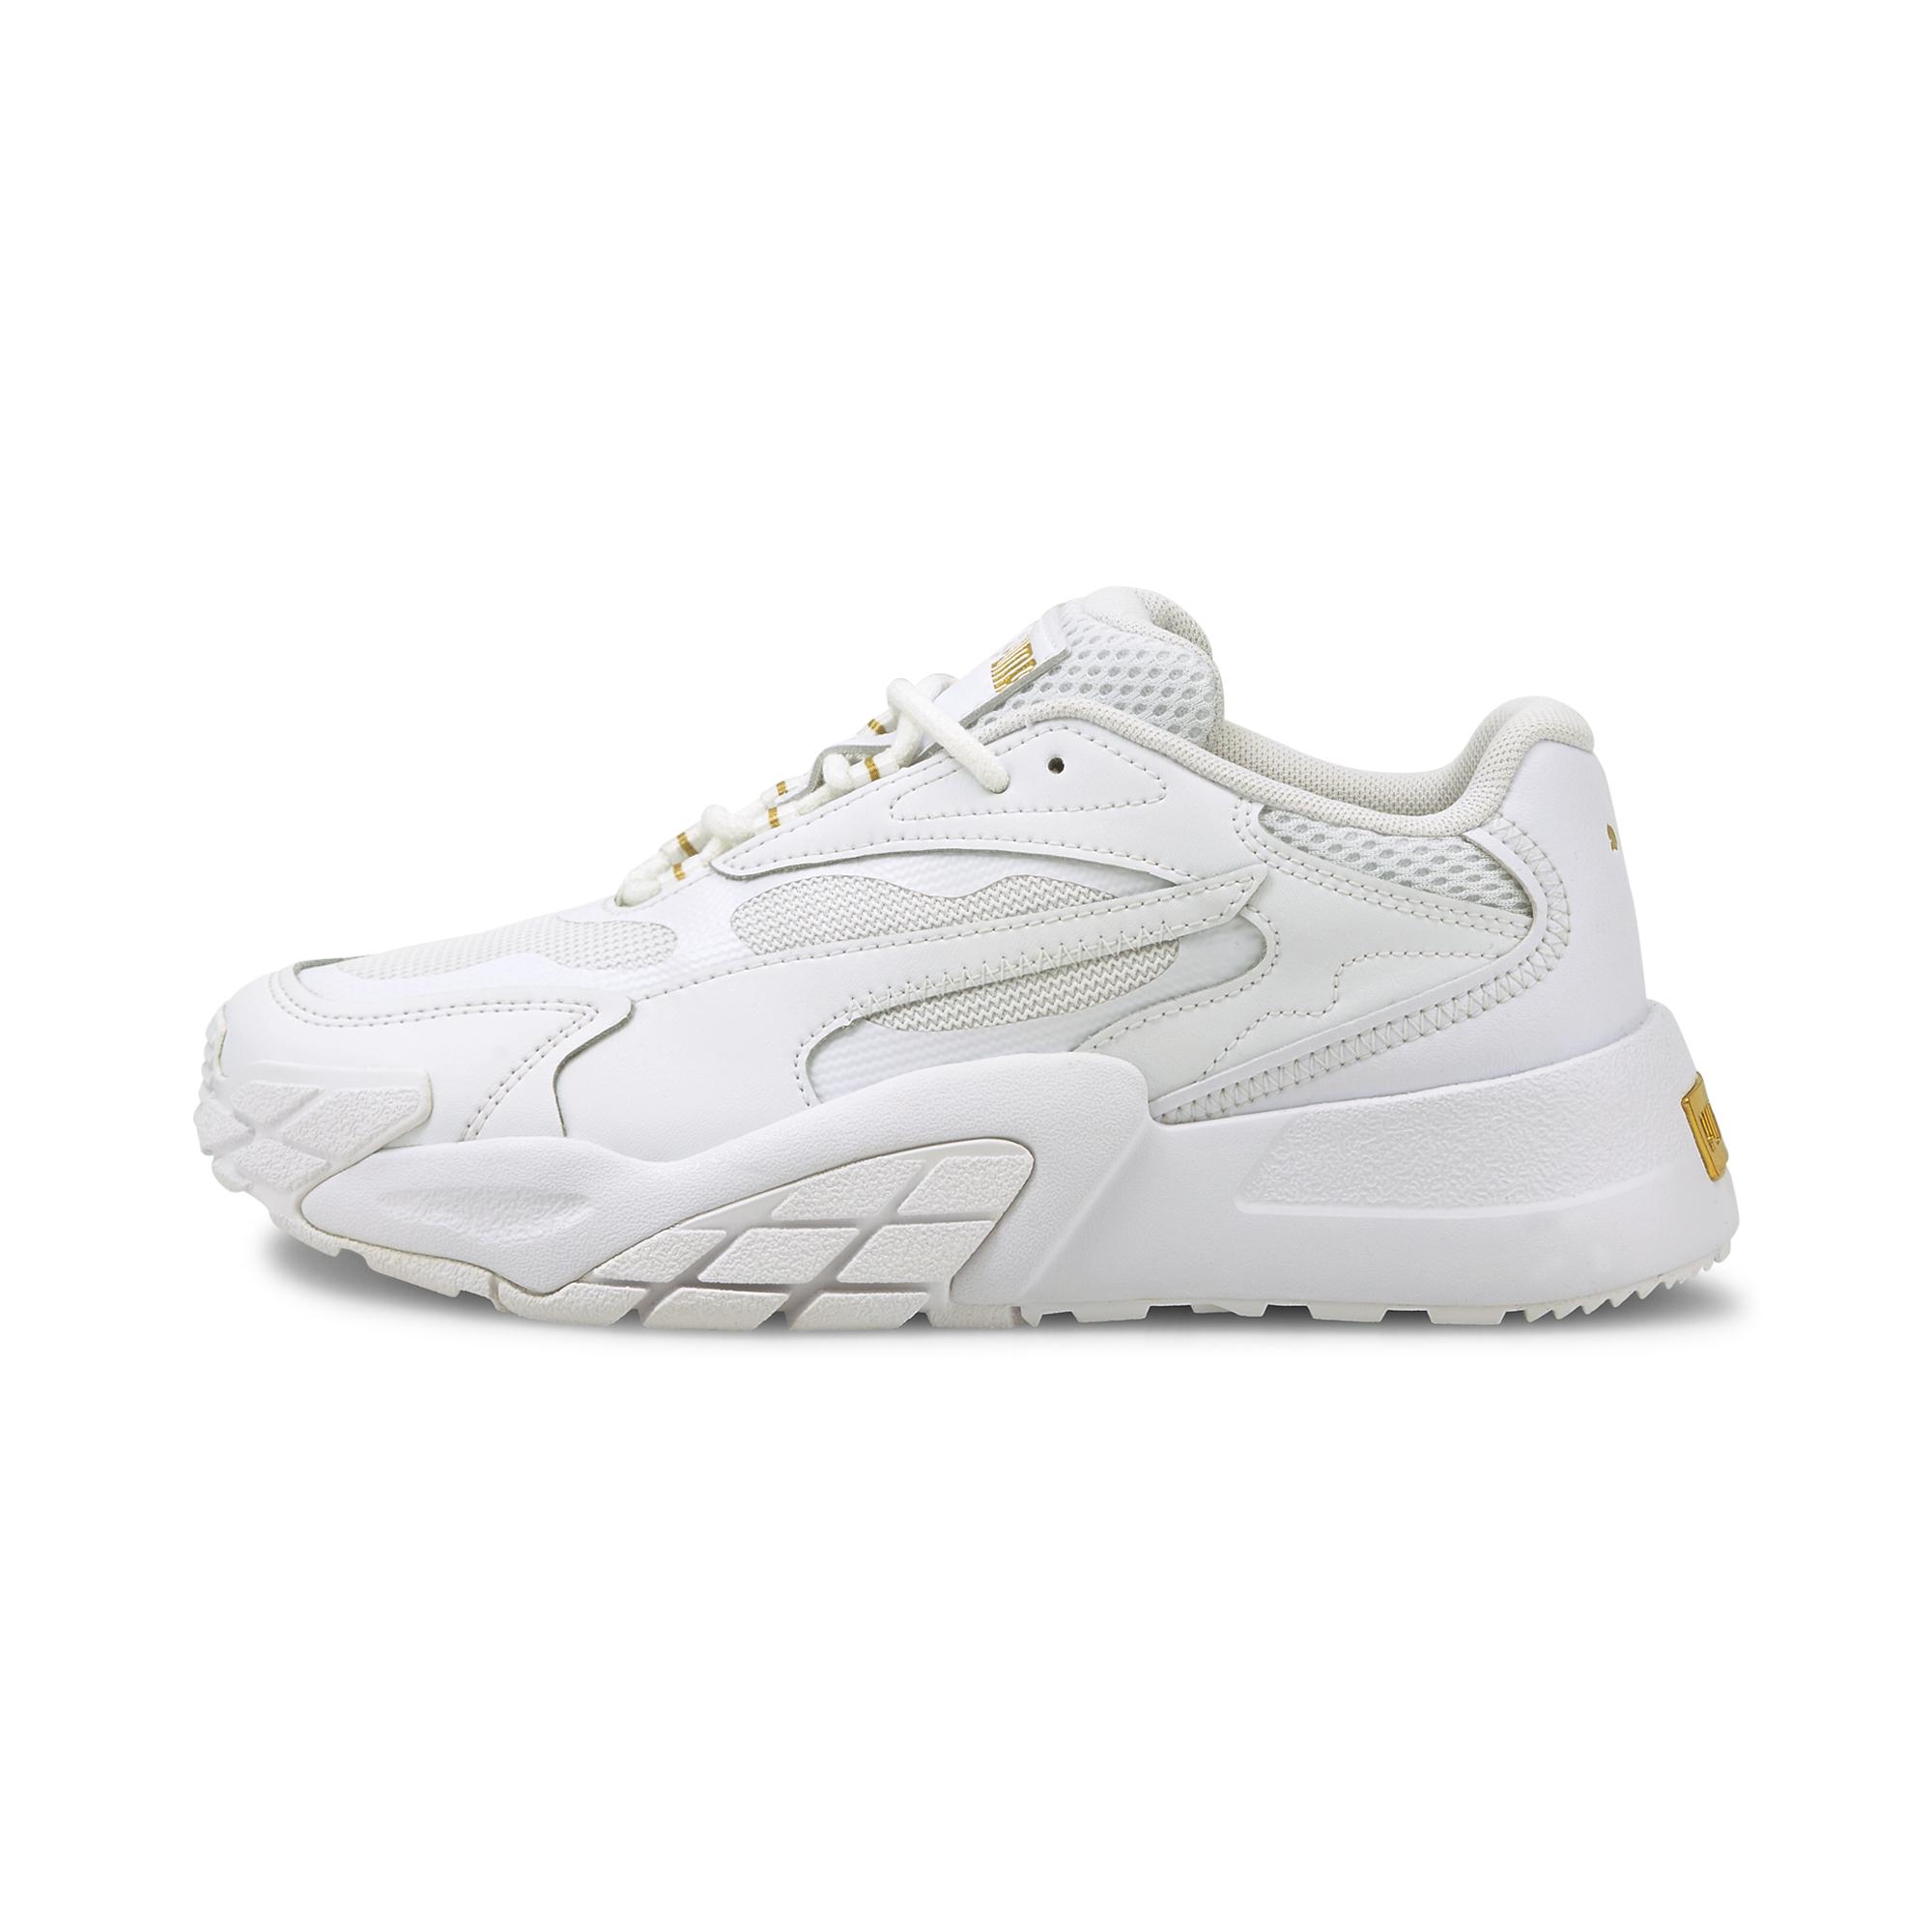 Puma Hedra Wn's sneakers